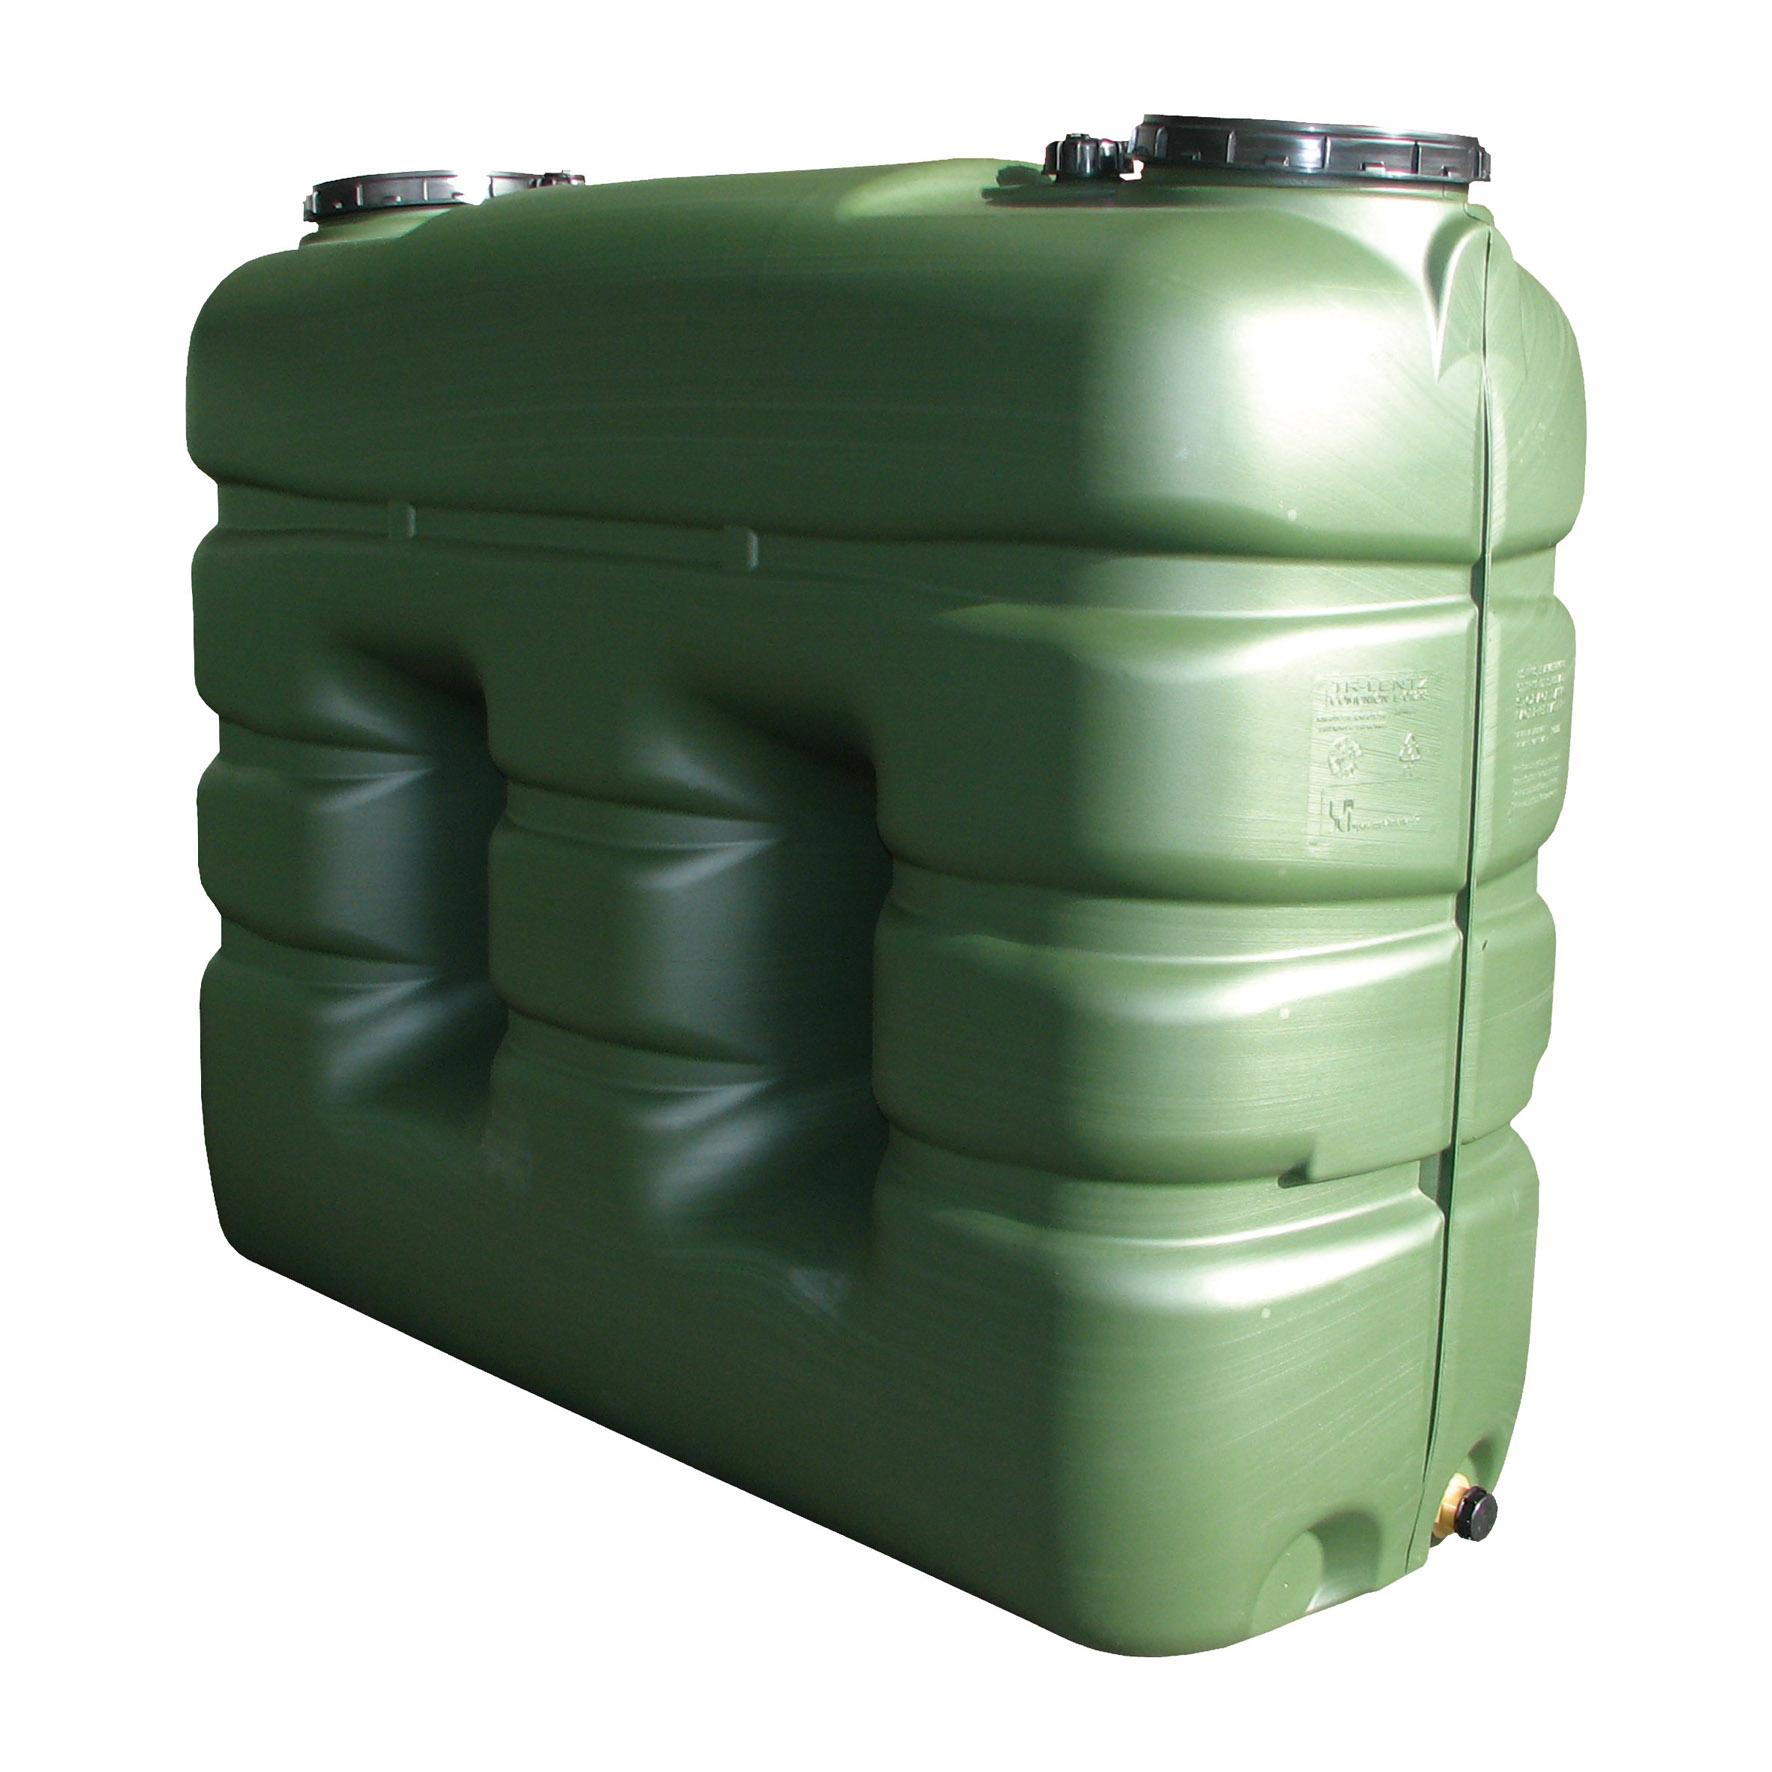 Casatherm catalogue des produits for Depositos de 1000 litros